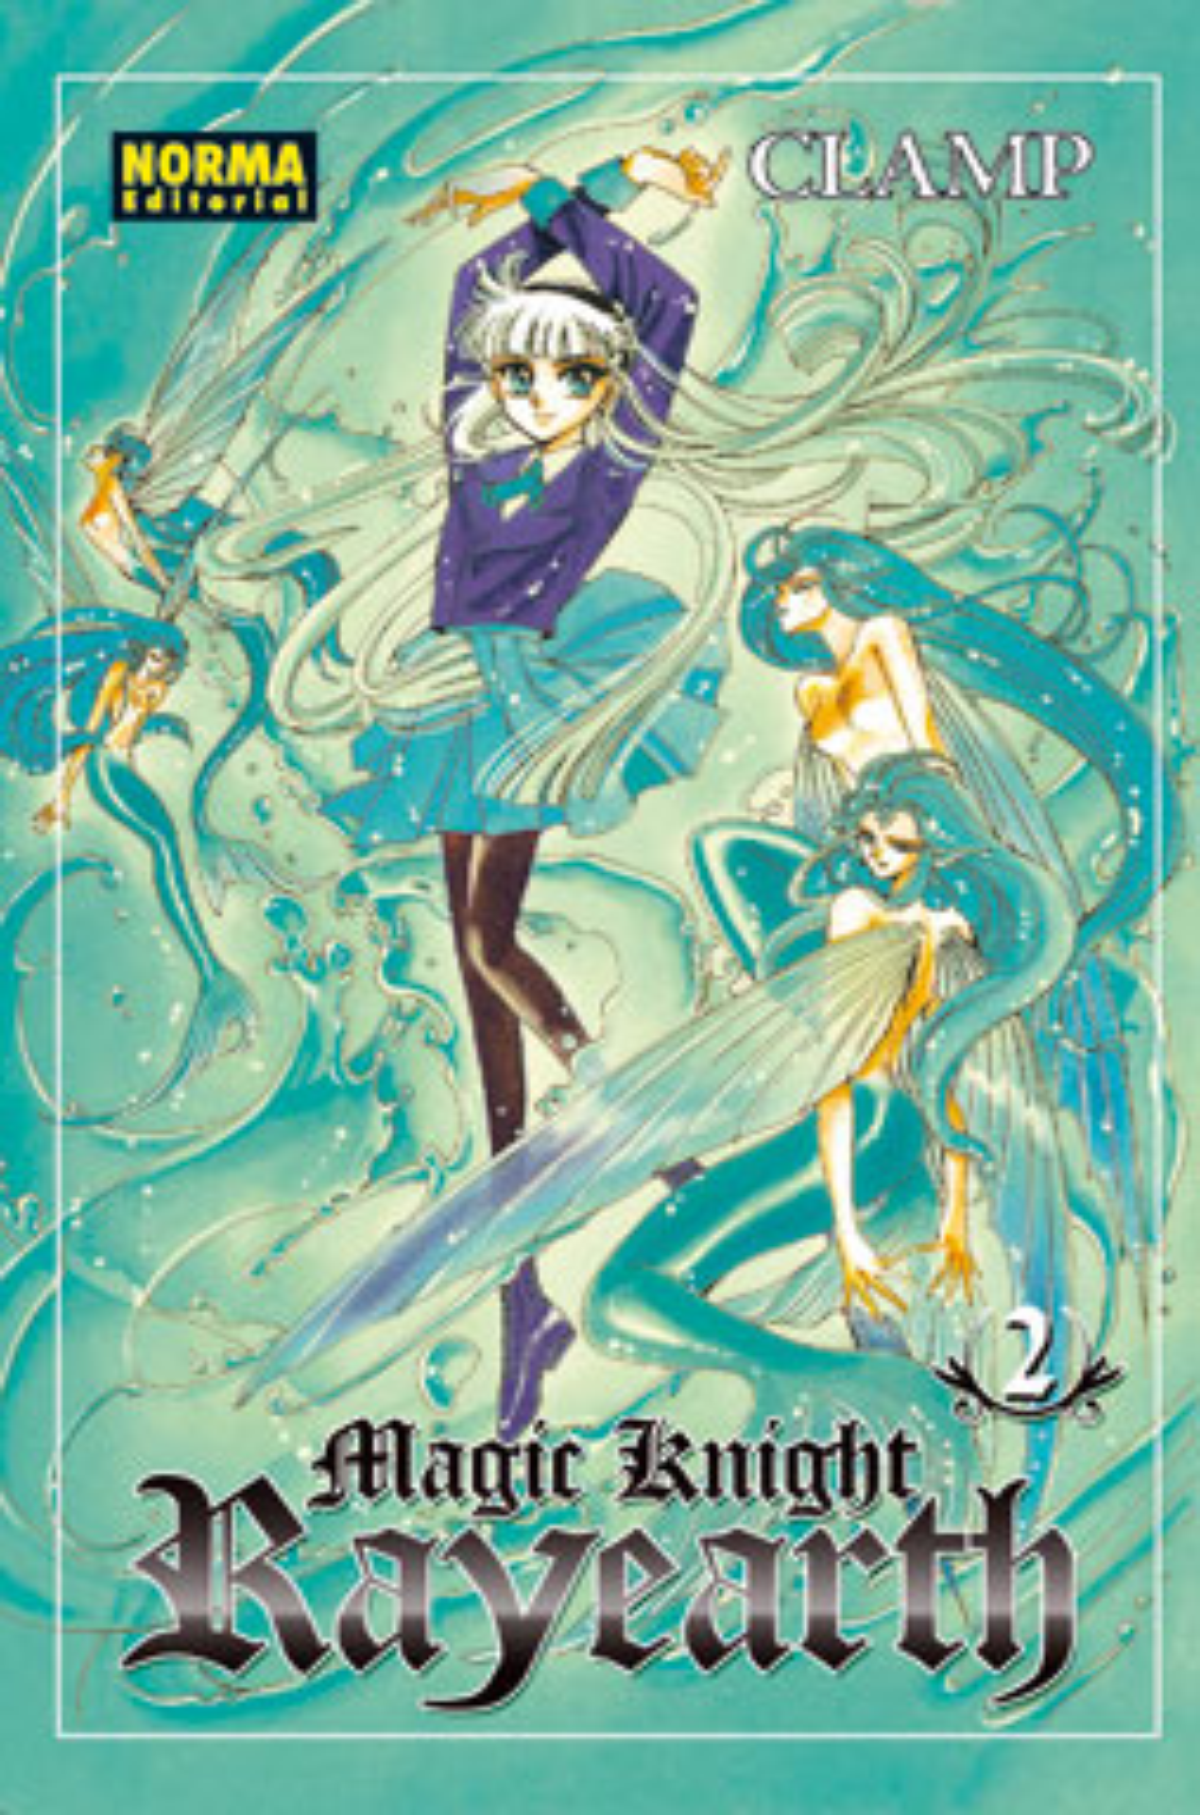 Magic Knight Rayearth, 2